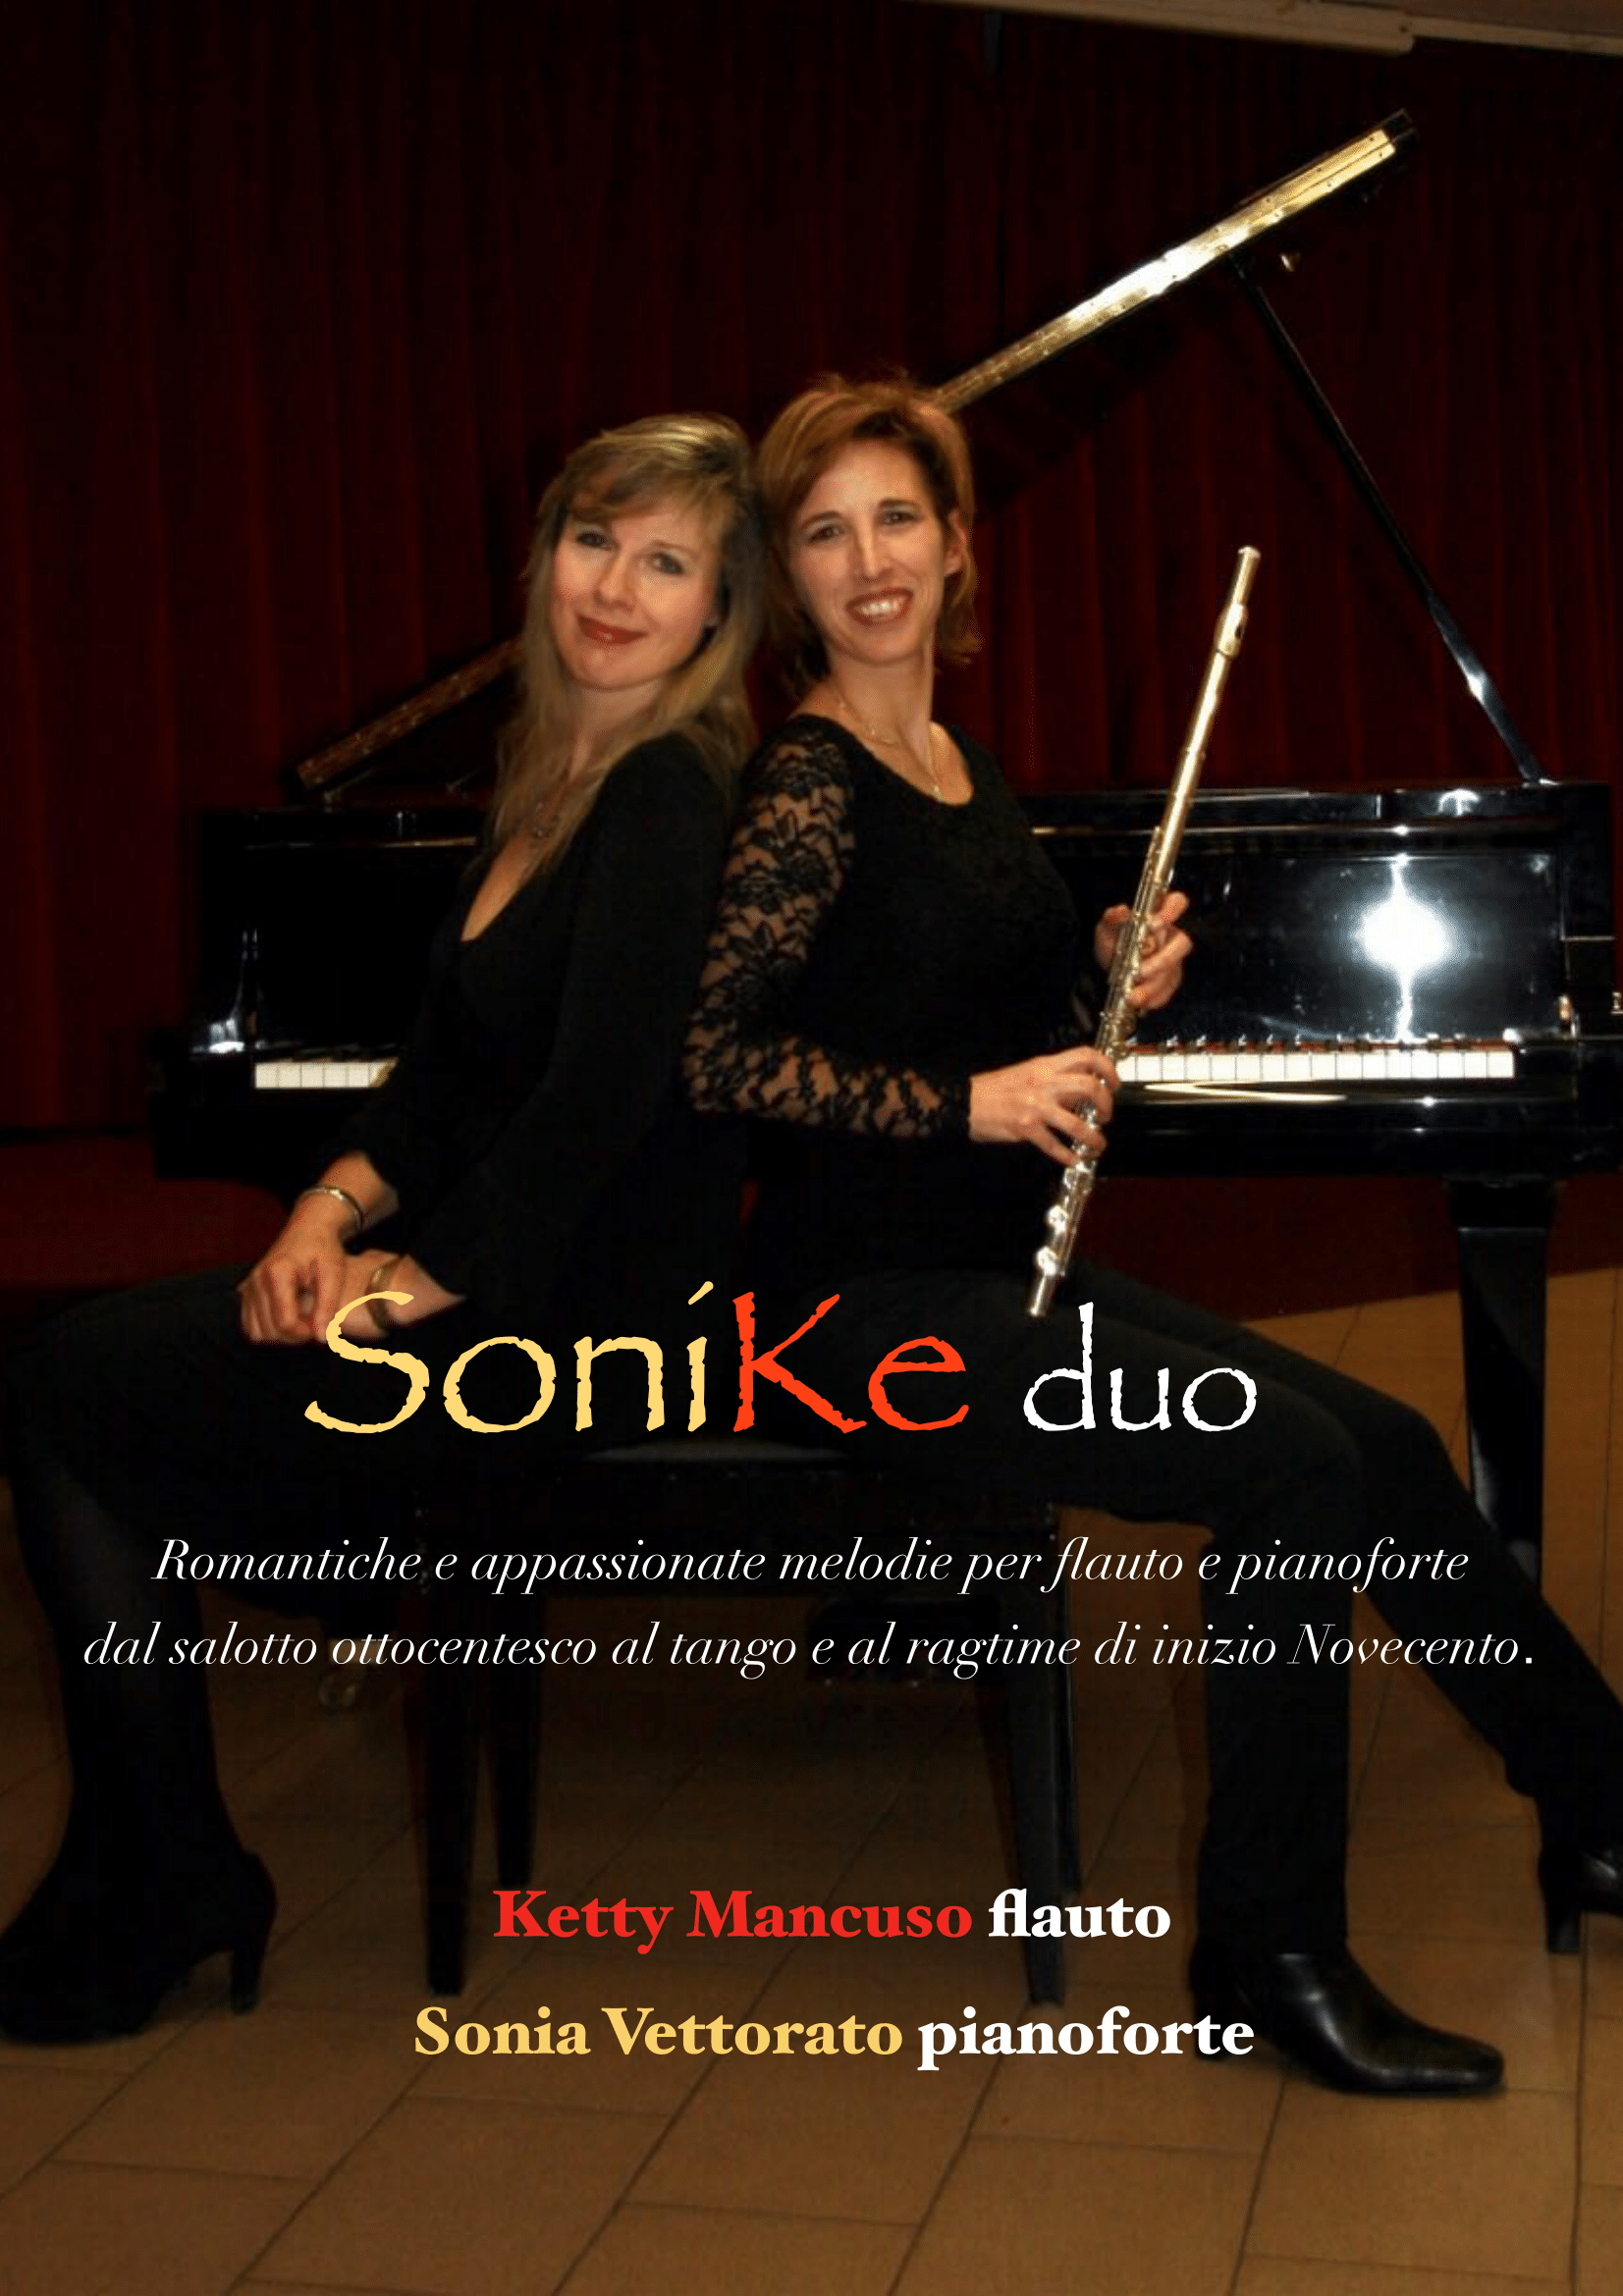 SoniKe duo-1